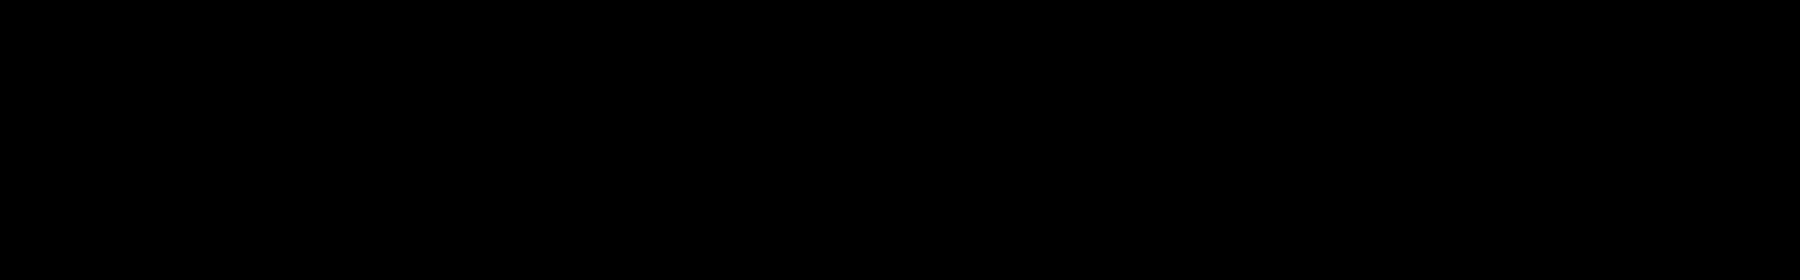 Triggerman audio waveform